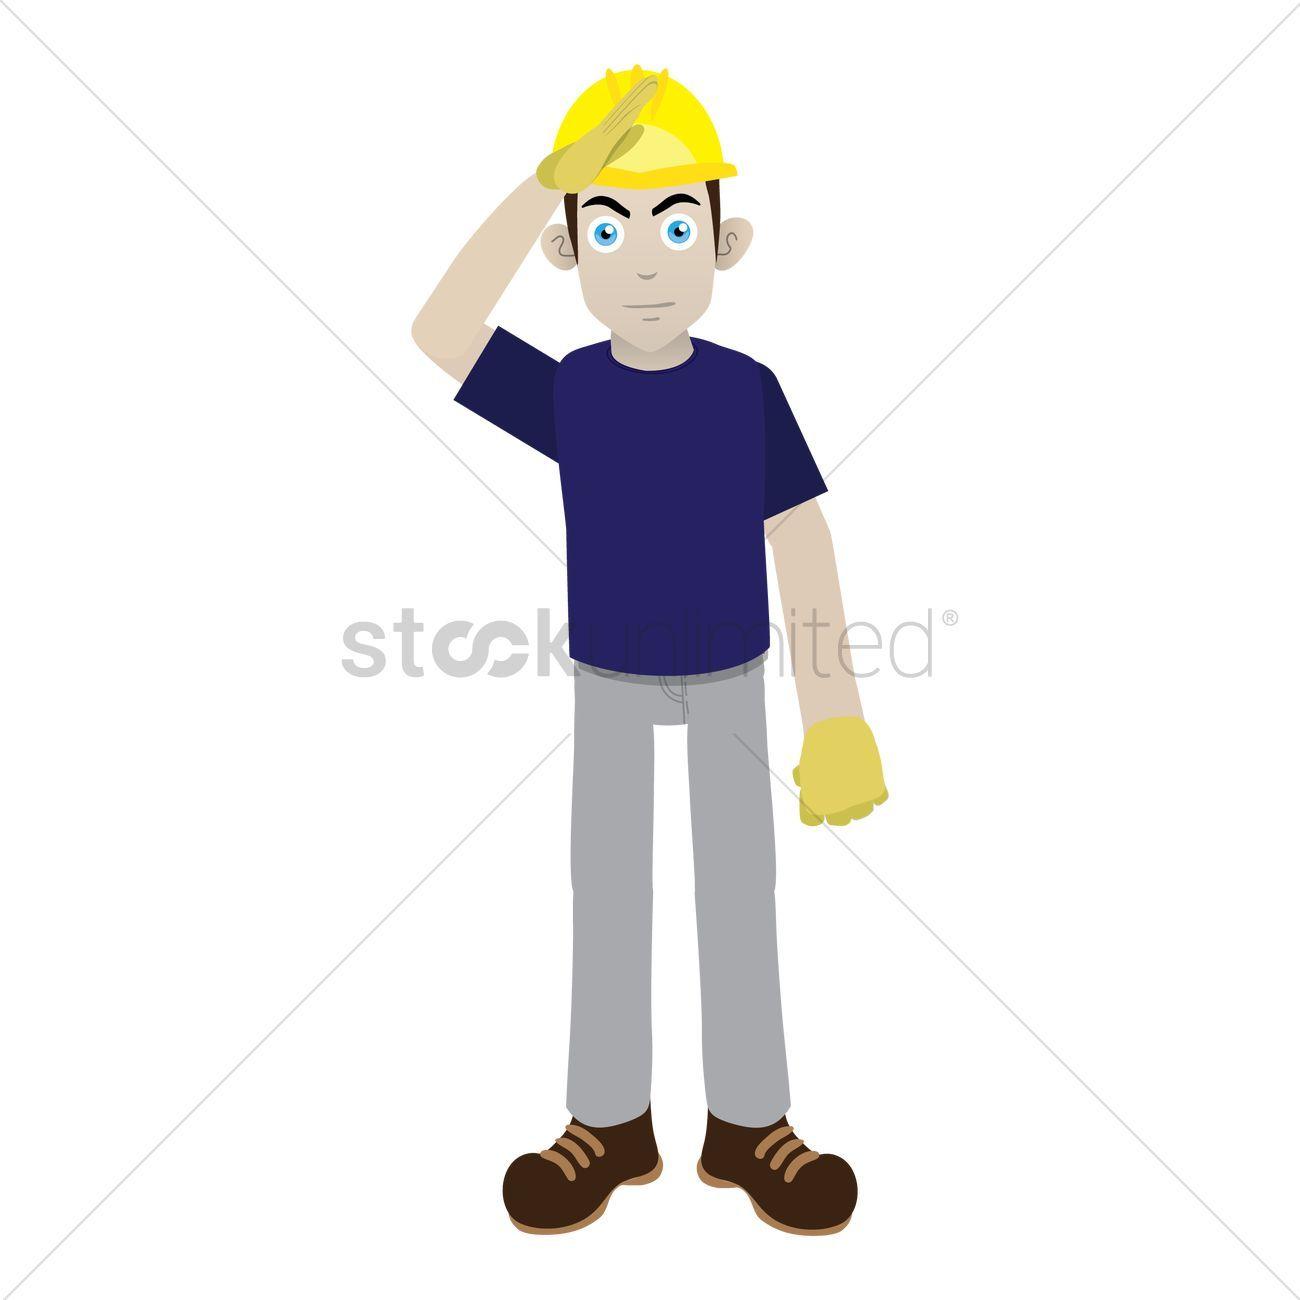 Construction Worker Saluting Vectors Stock Clipart Sponsored Saluting Worker Construction Clipart Stock Affiliate